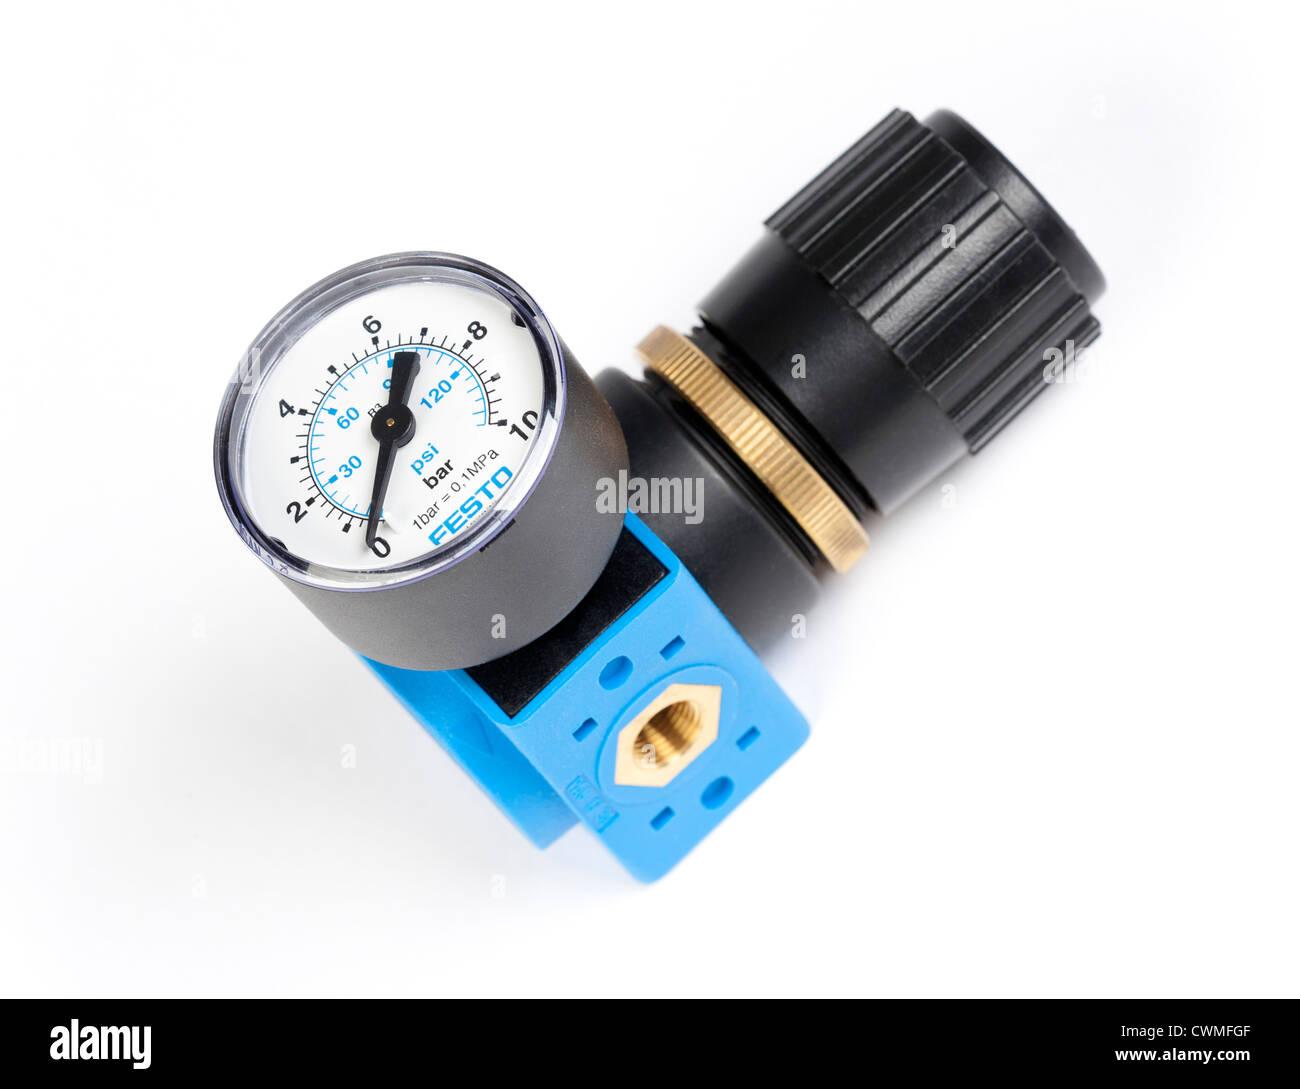 Festo air pressure regulator and gauge Stock Photo: 50238399